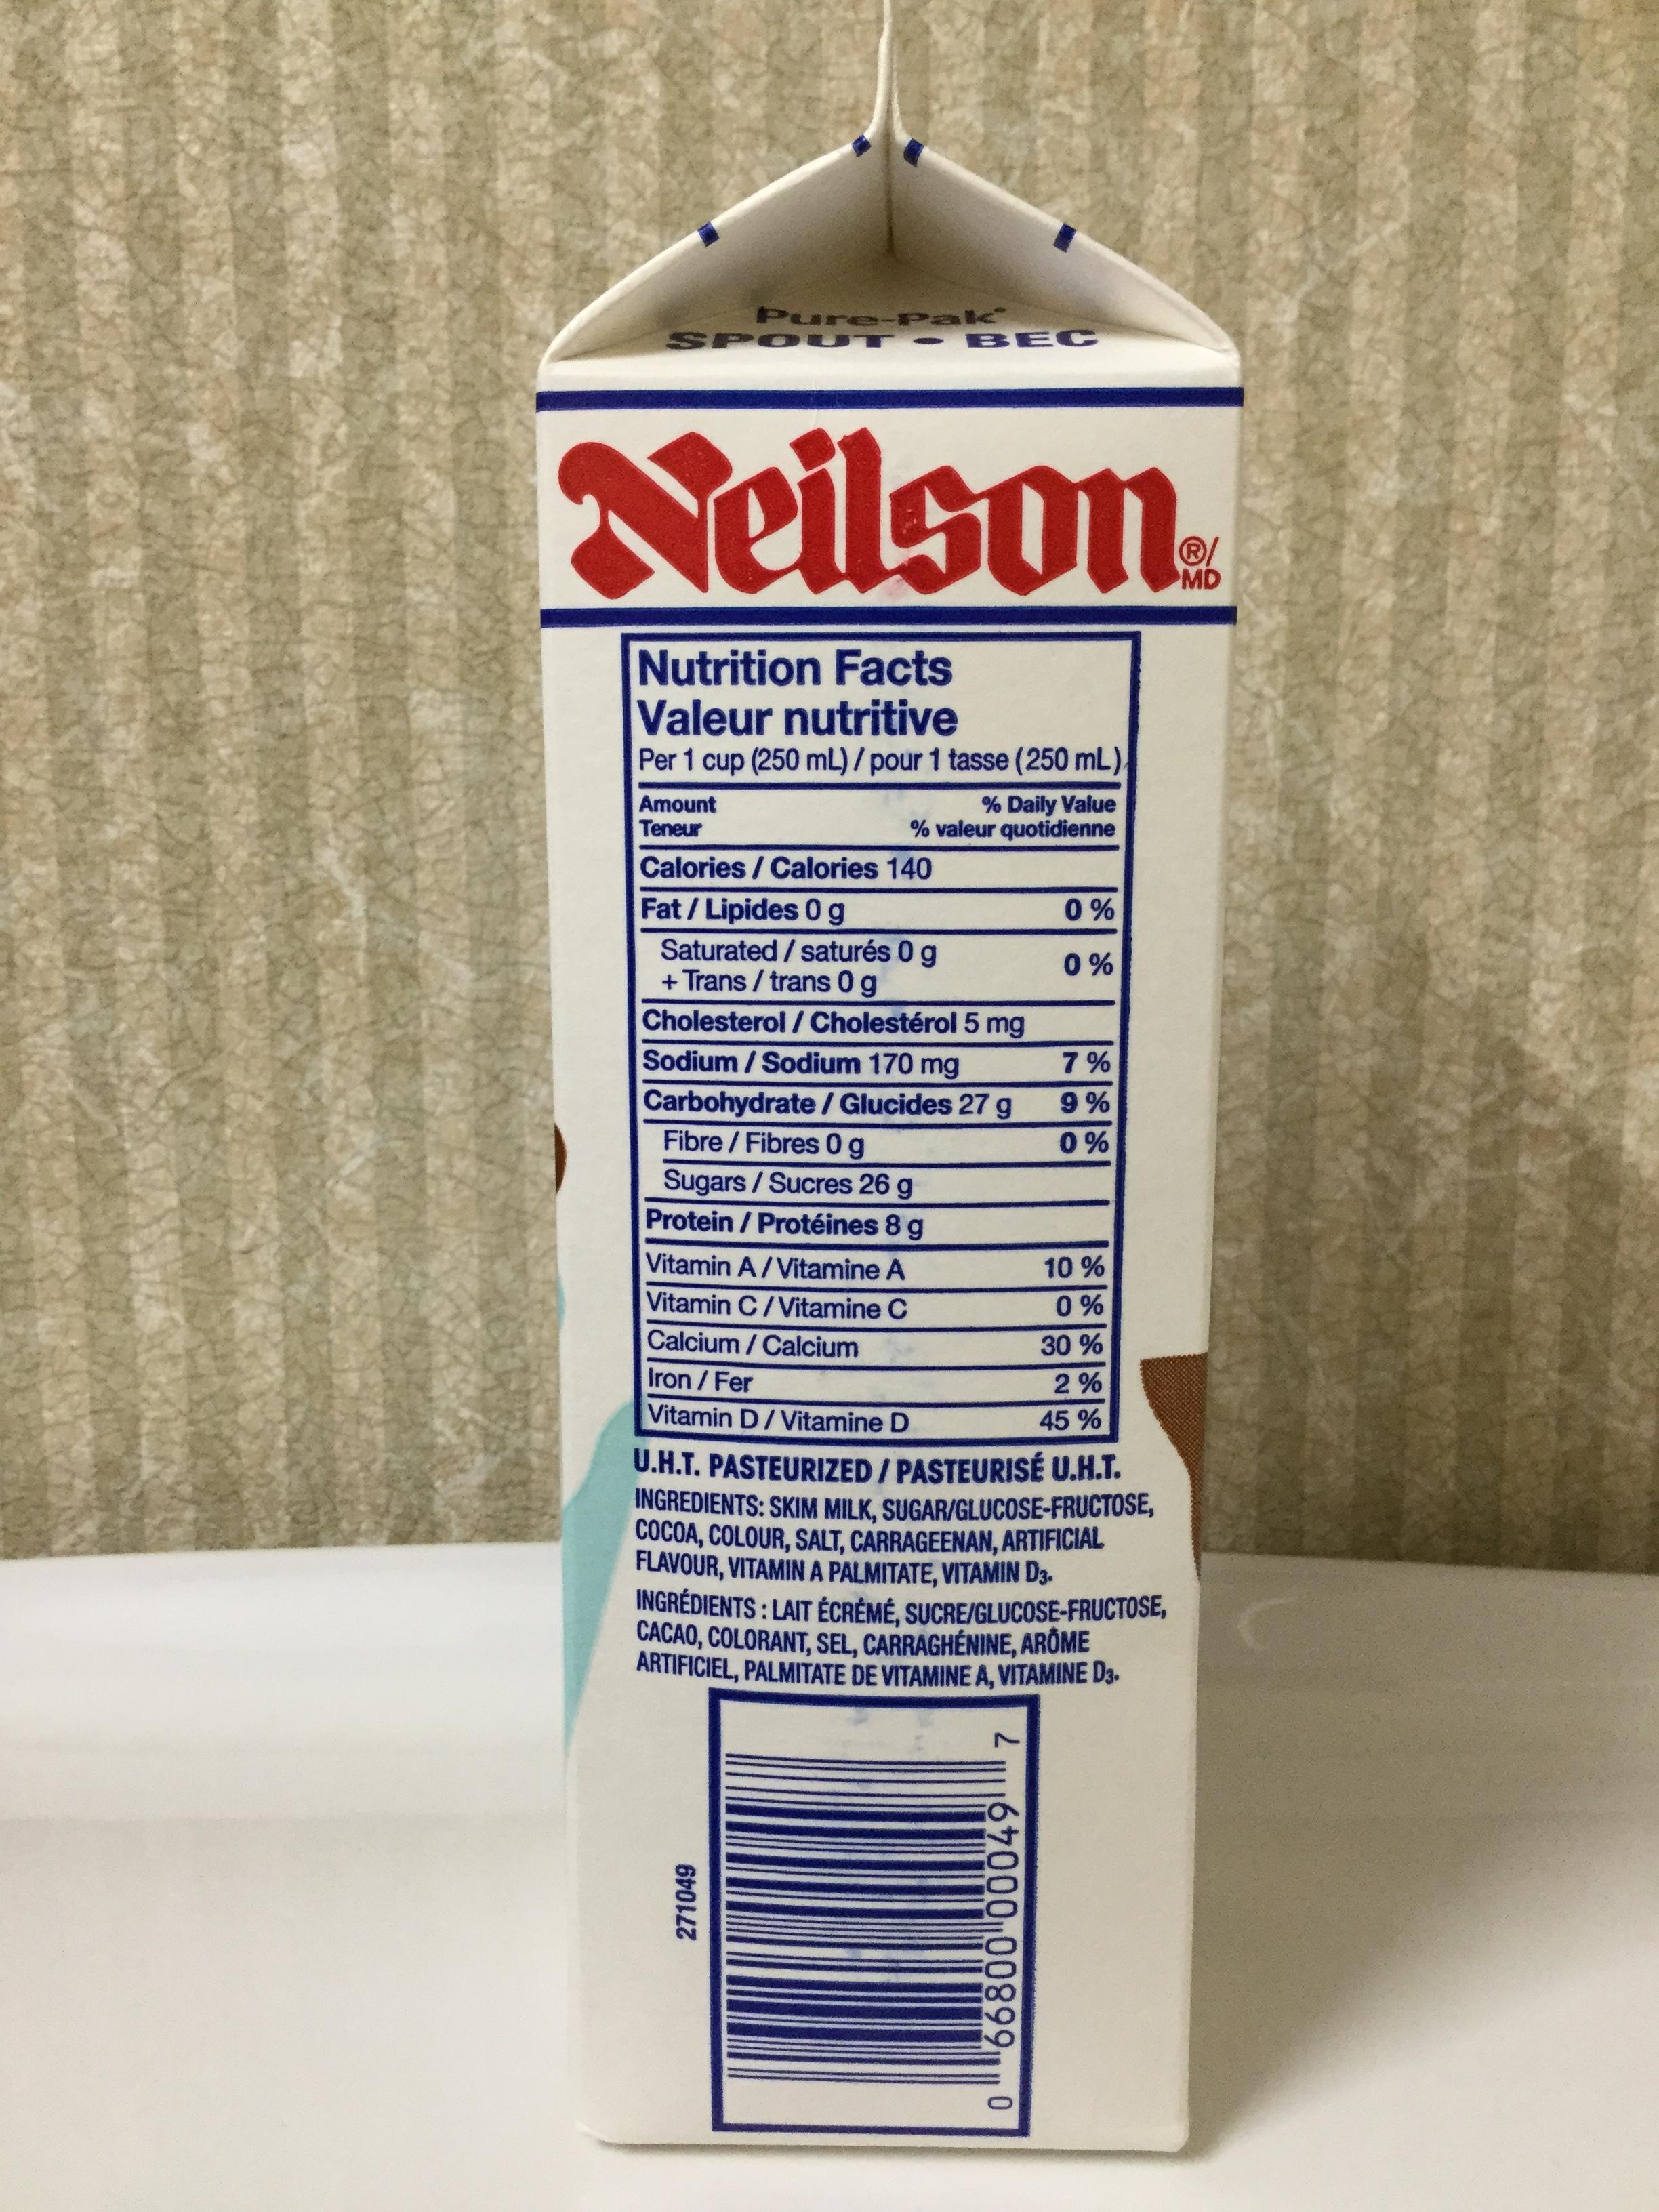 Neilson Fat Free Chocolate Milk Side 1